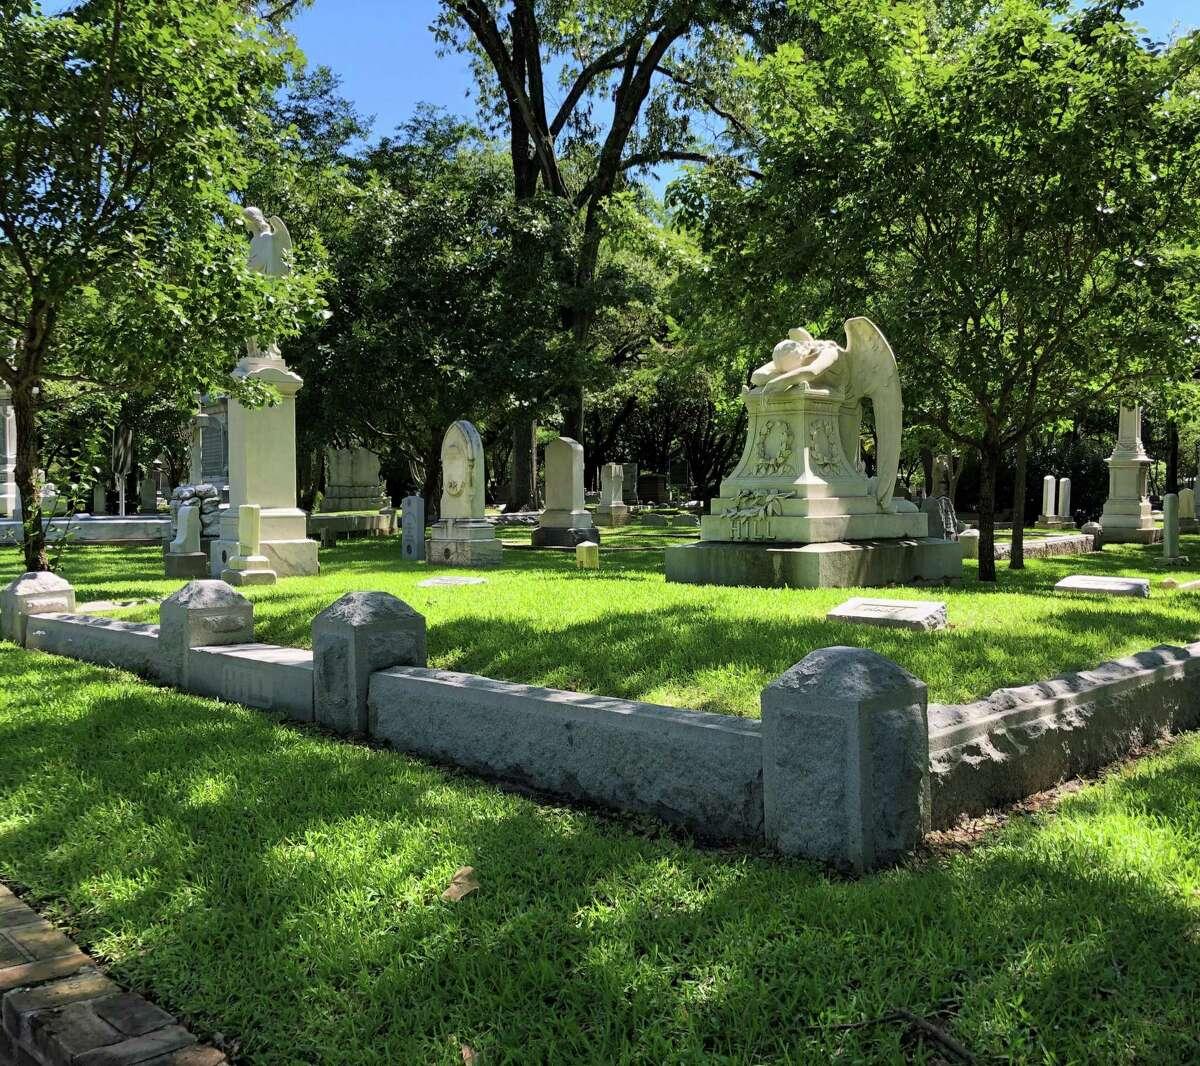 Scene from the historic Glenwood Cemetery.